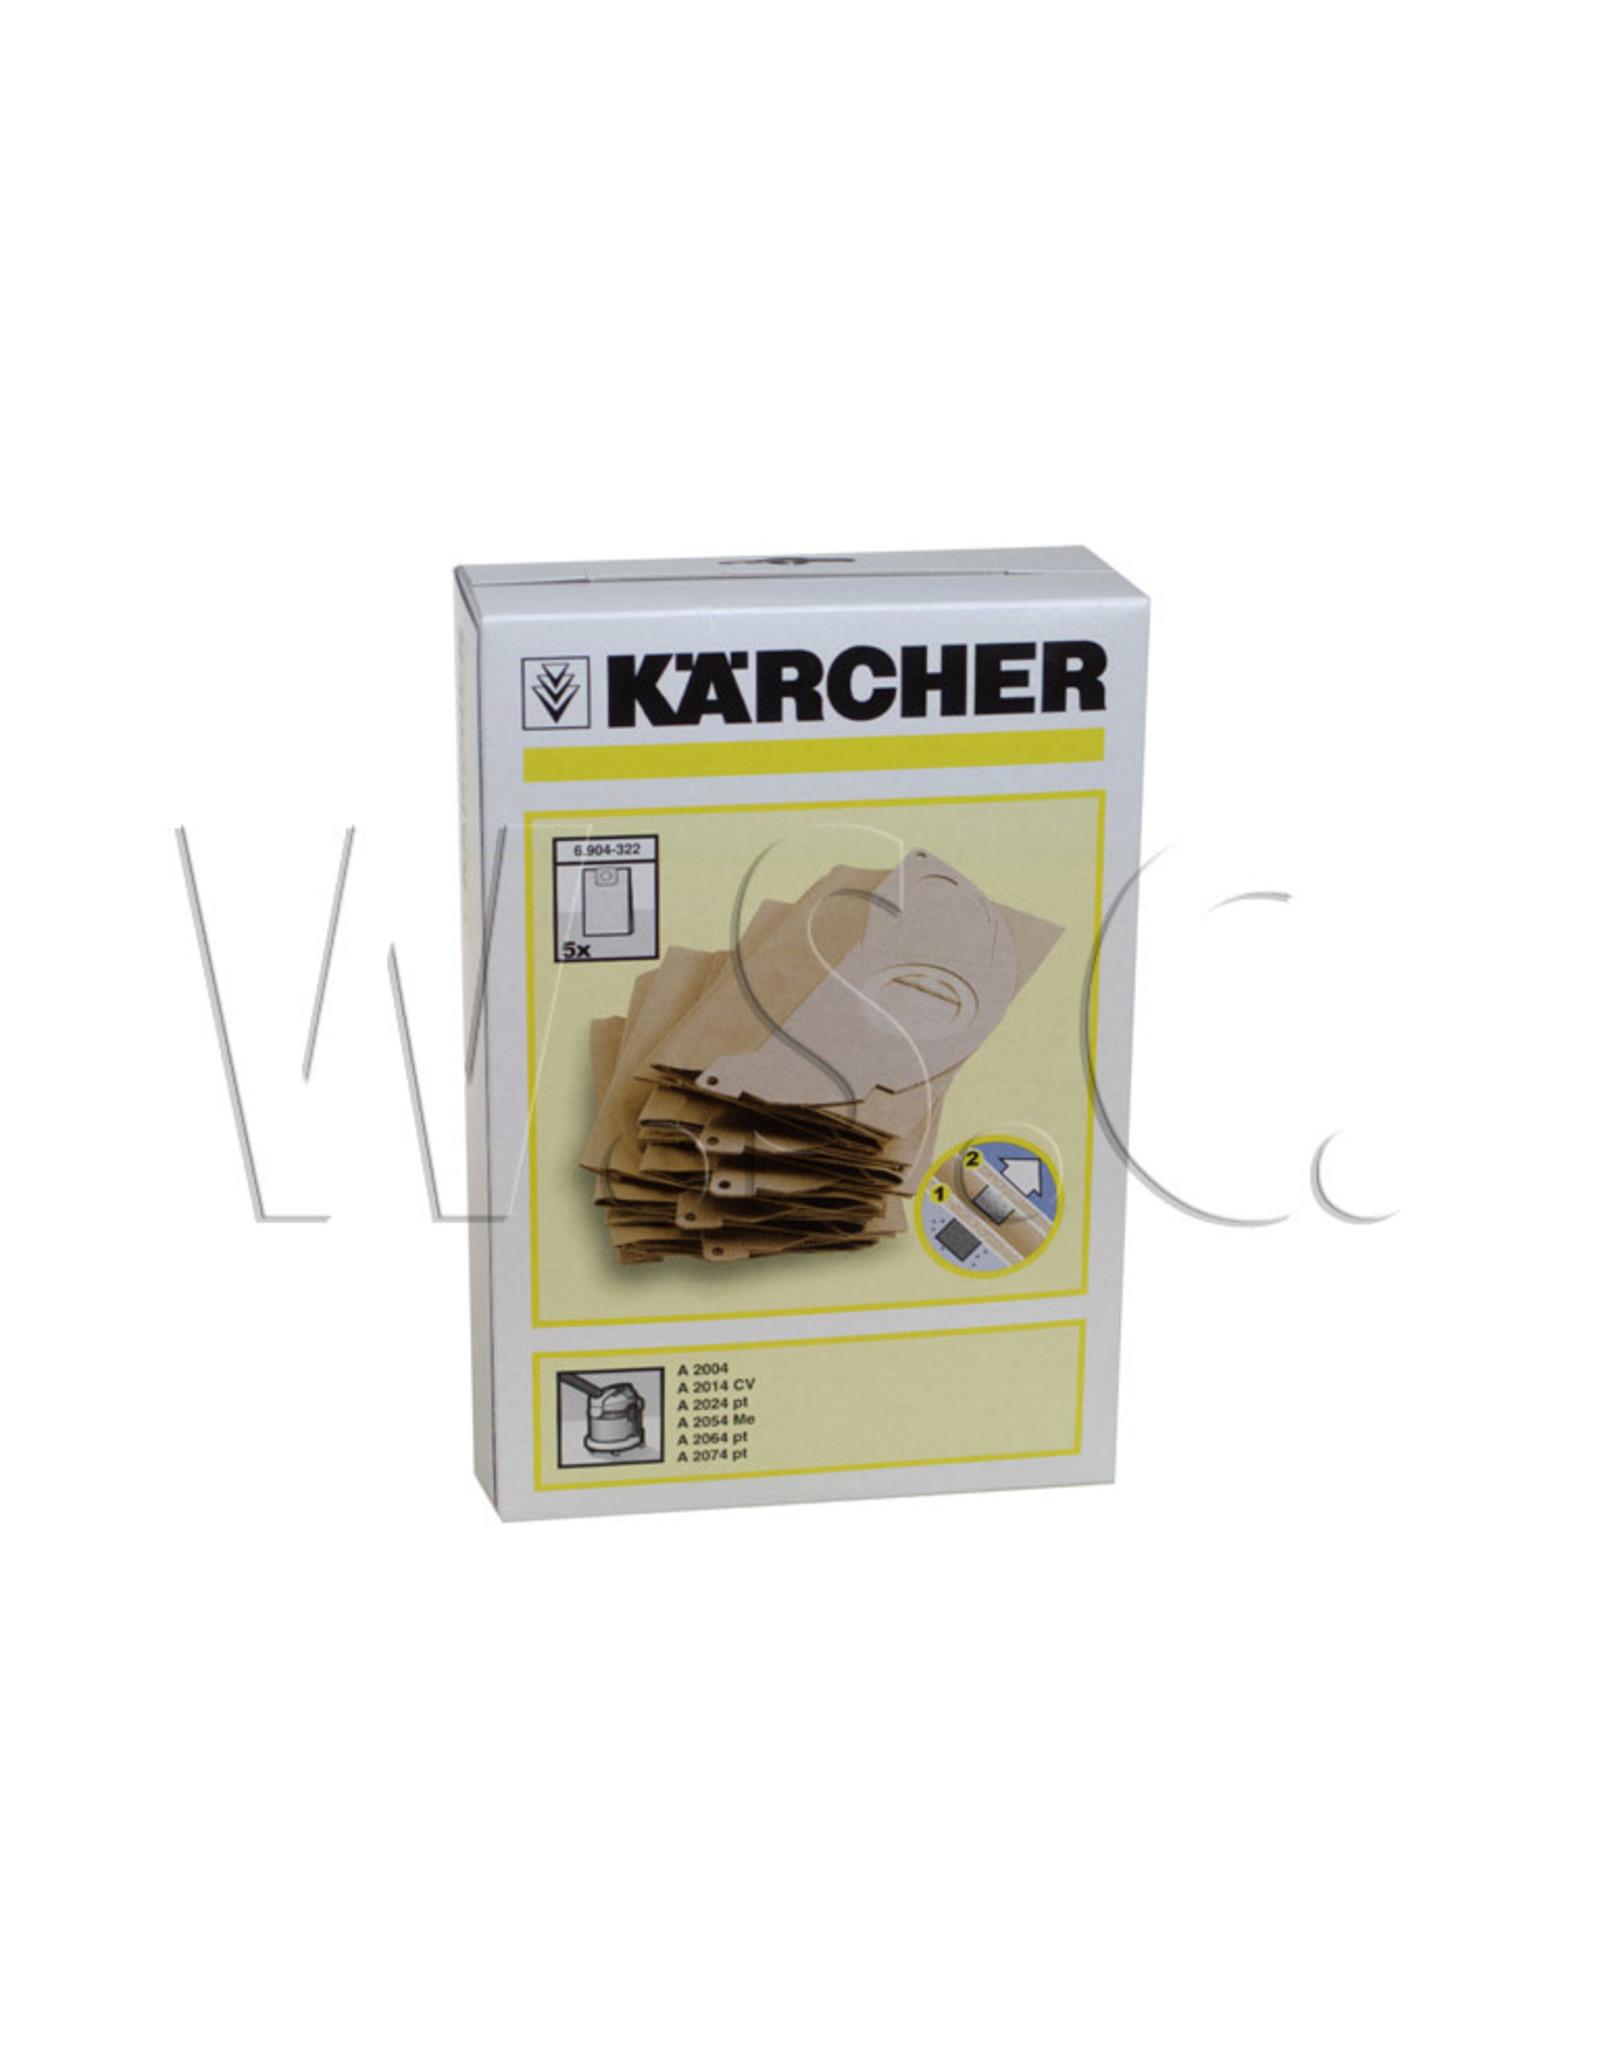 Karcher KARCHER A 2004-2014-2024-2054-2064-2074